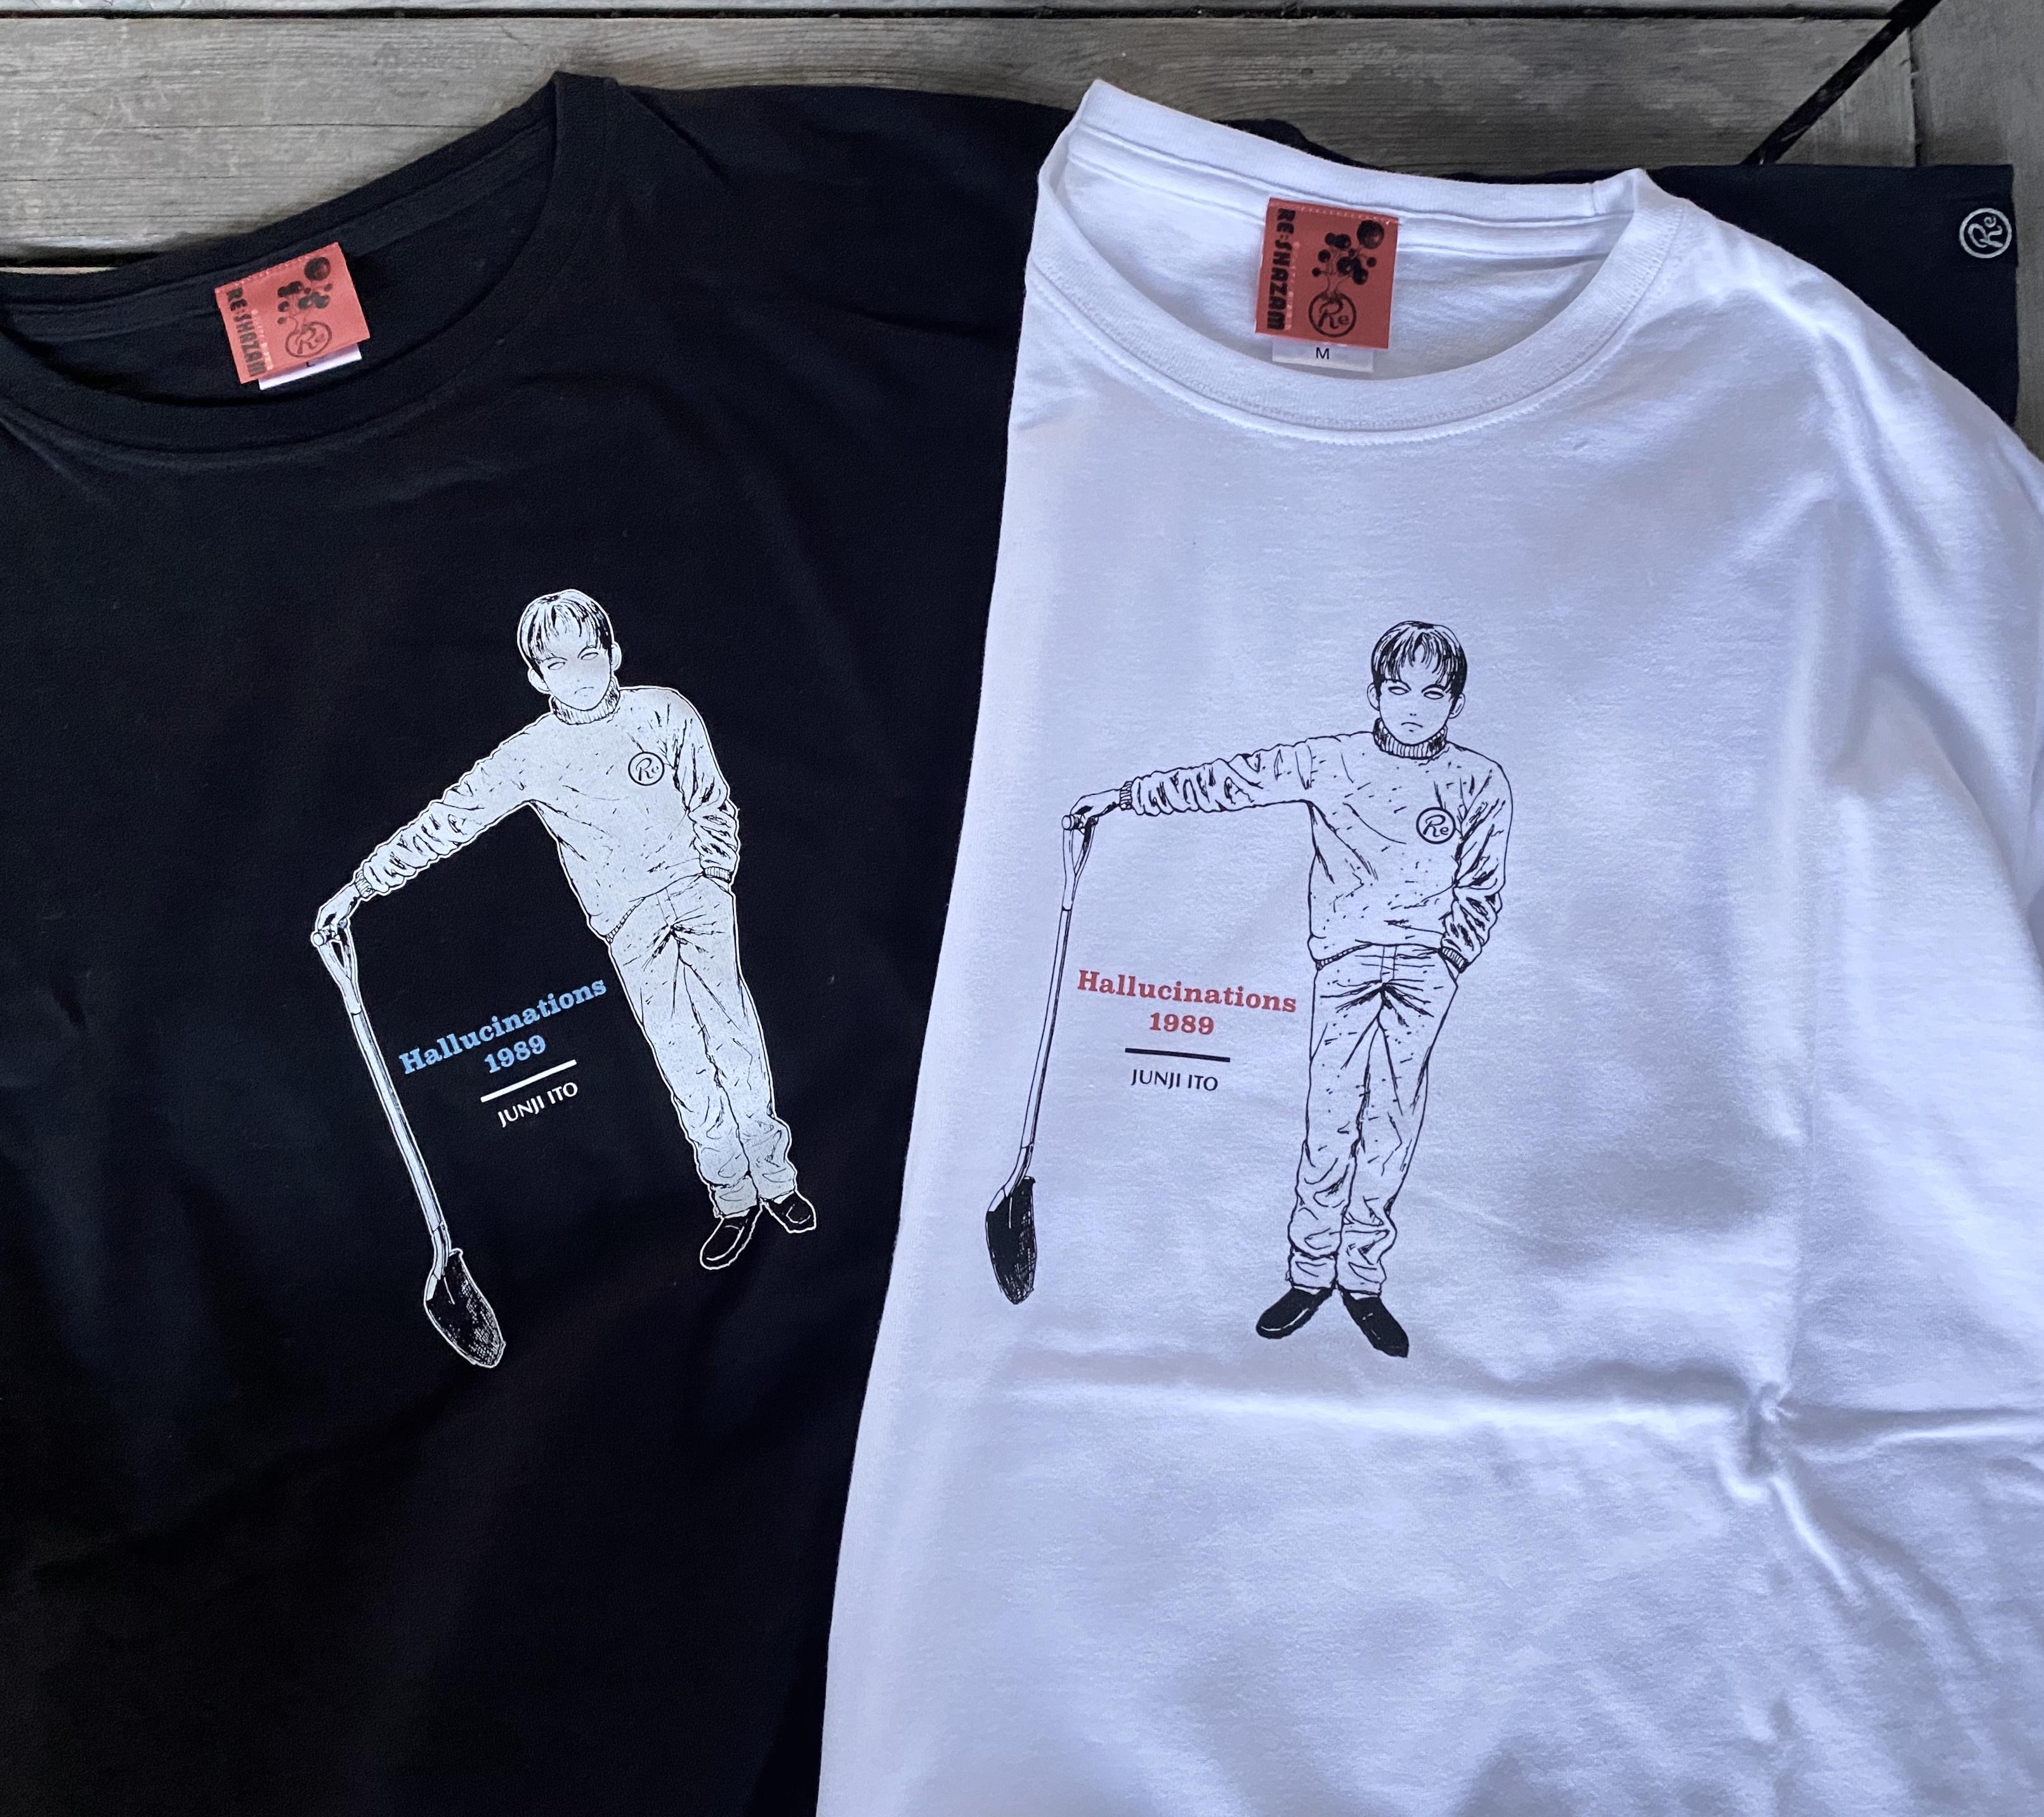 〈伊藤 潤二〉押切異談-首幻想- Tシャツ(WHITE)